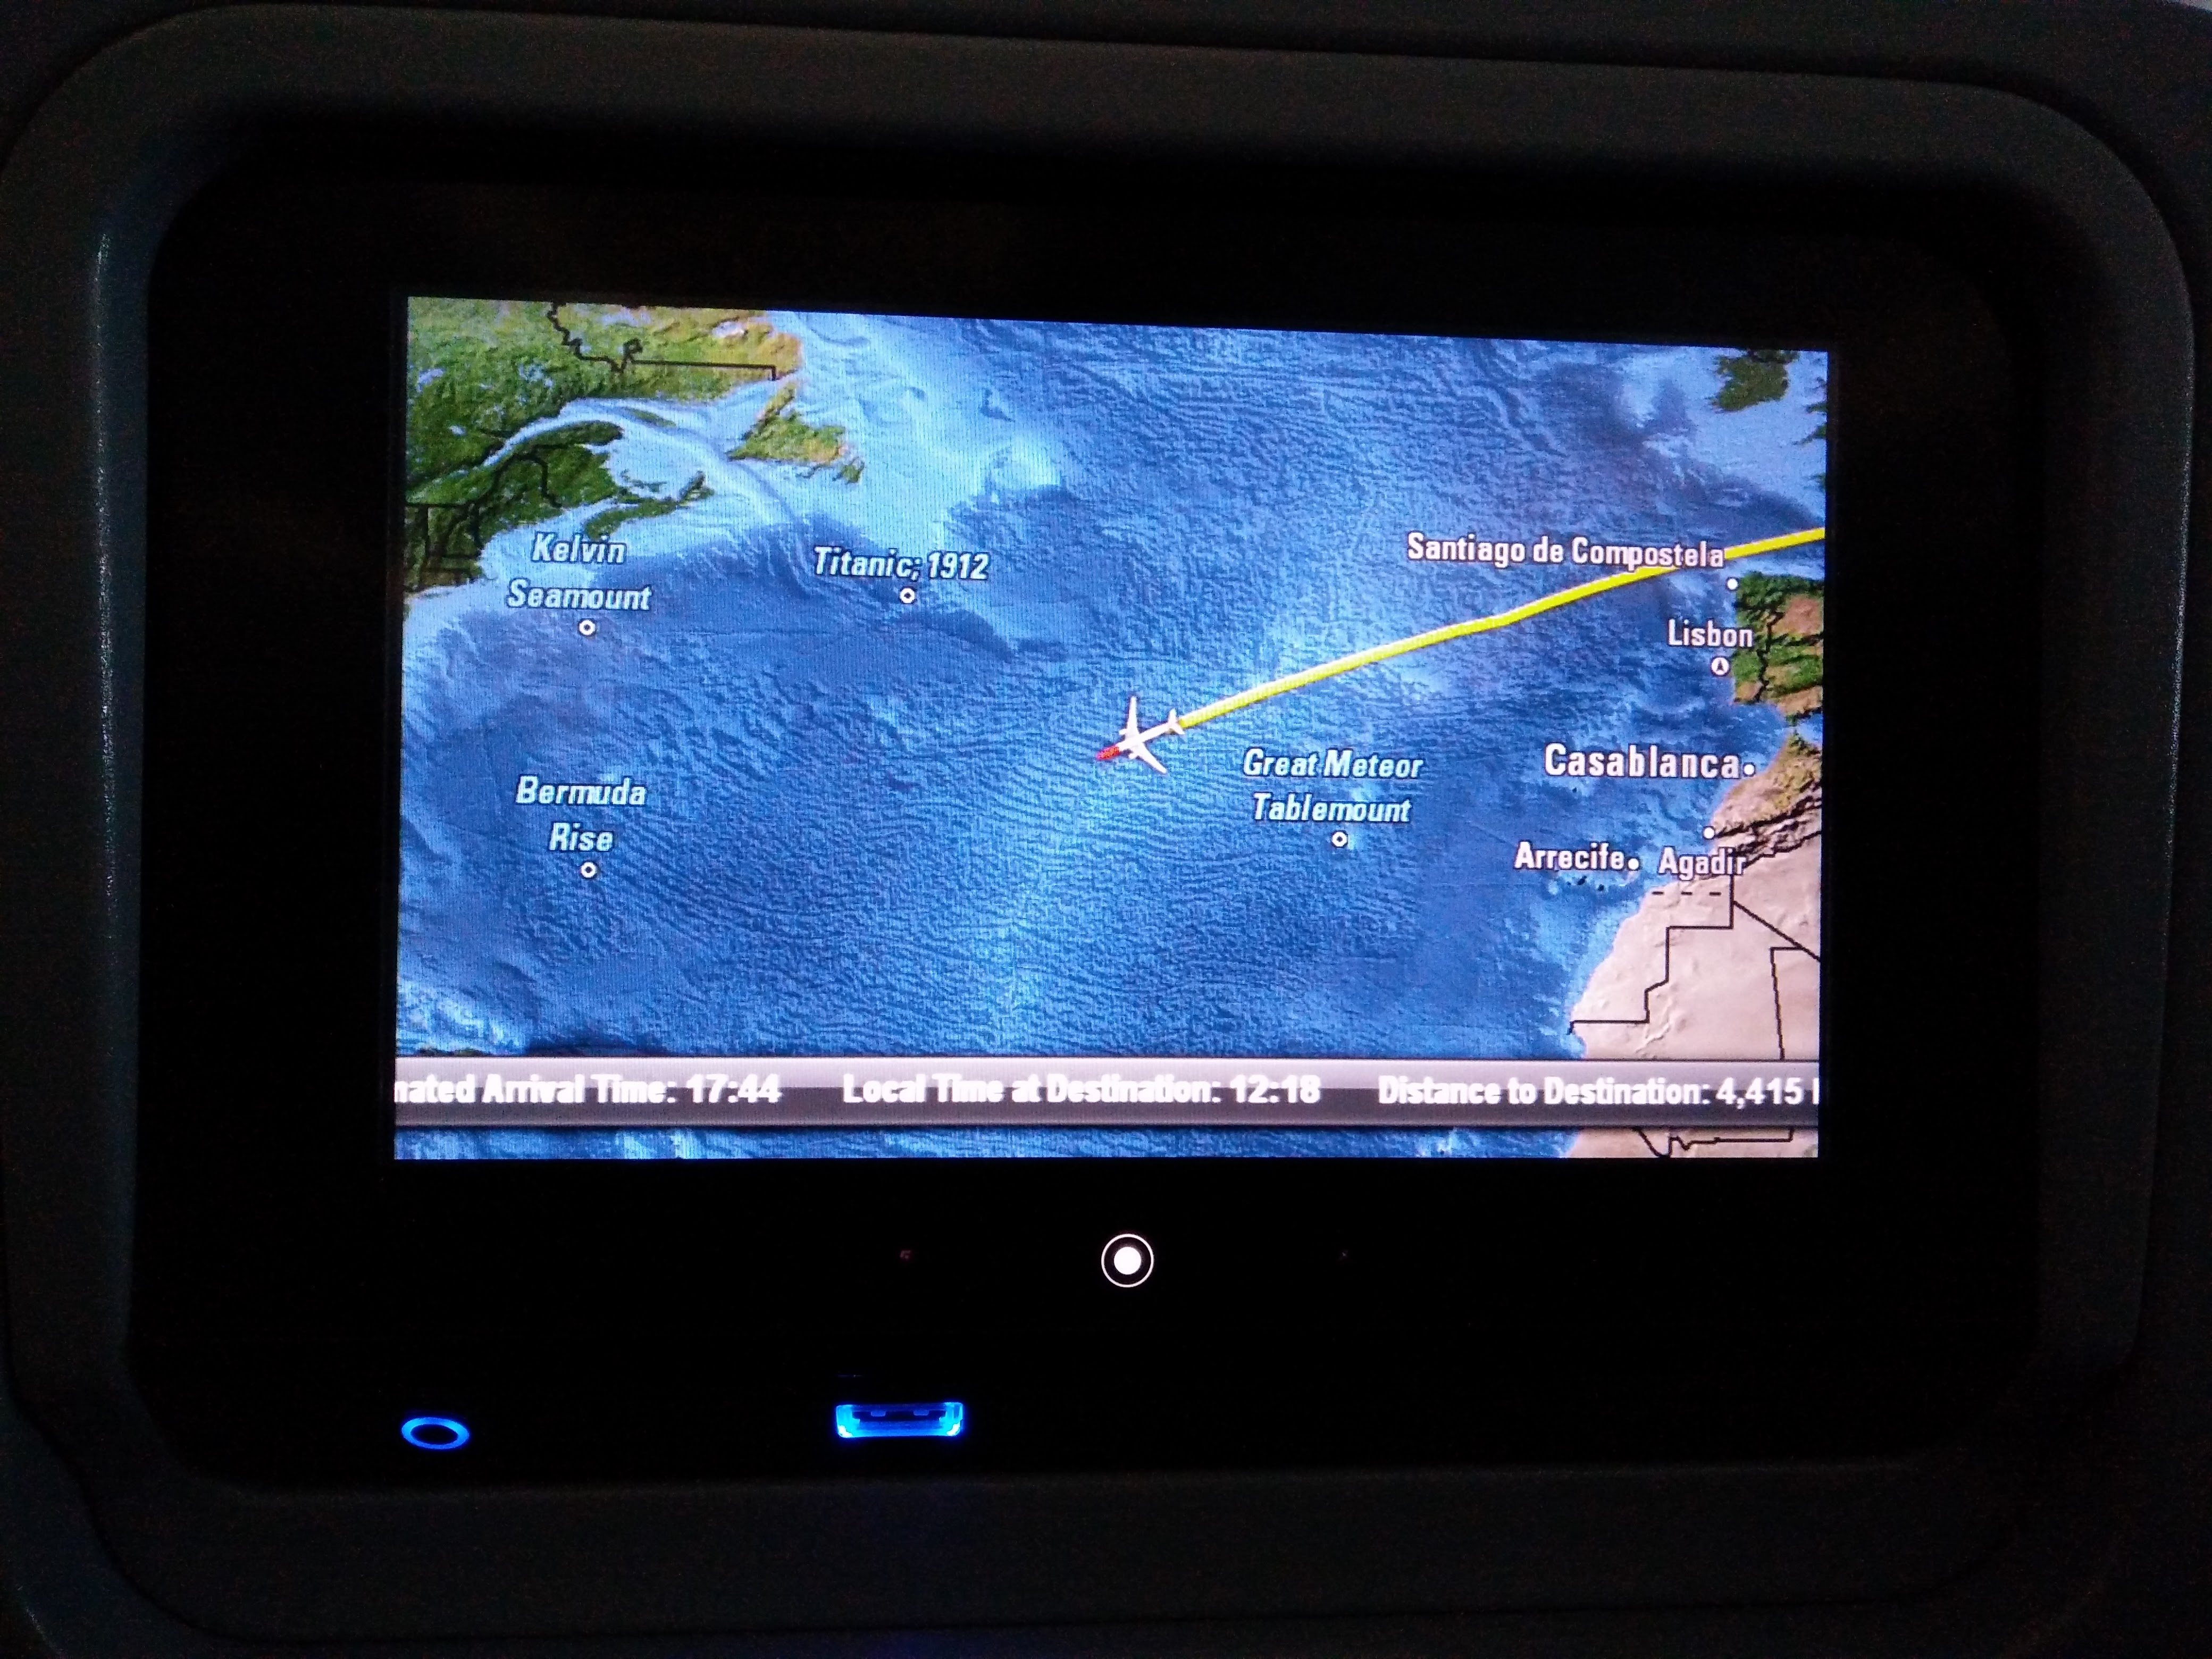 Edelweiss Air Seat Maps Seatmaestro